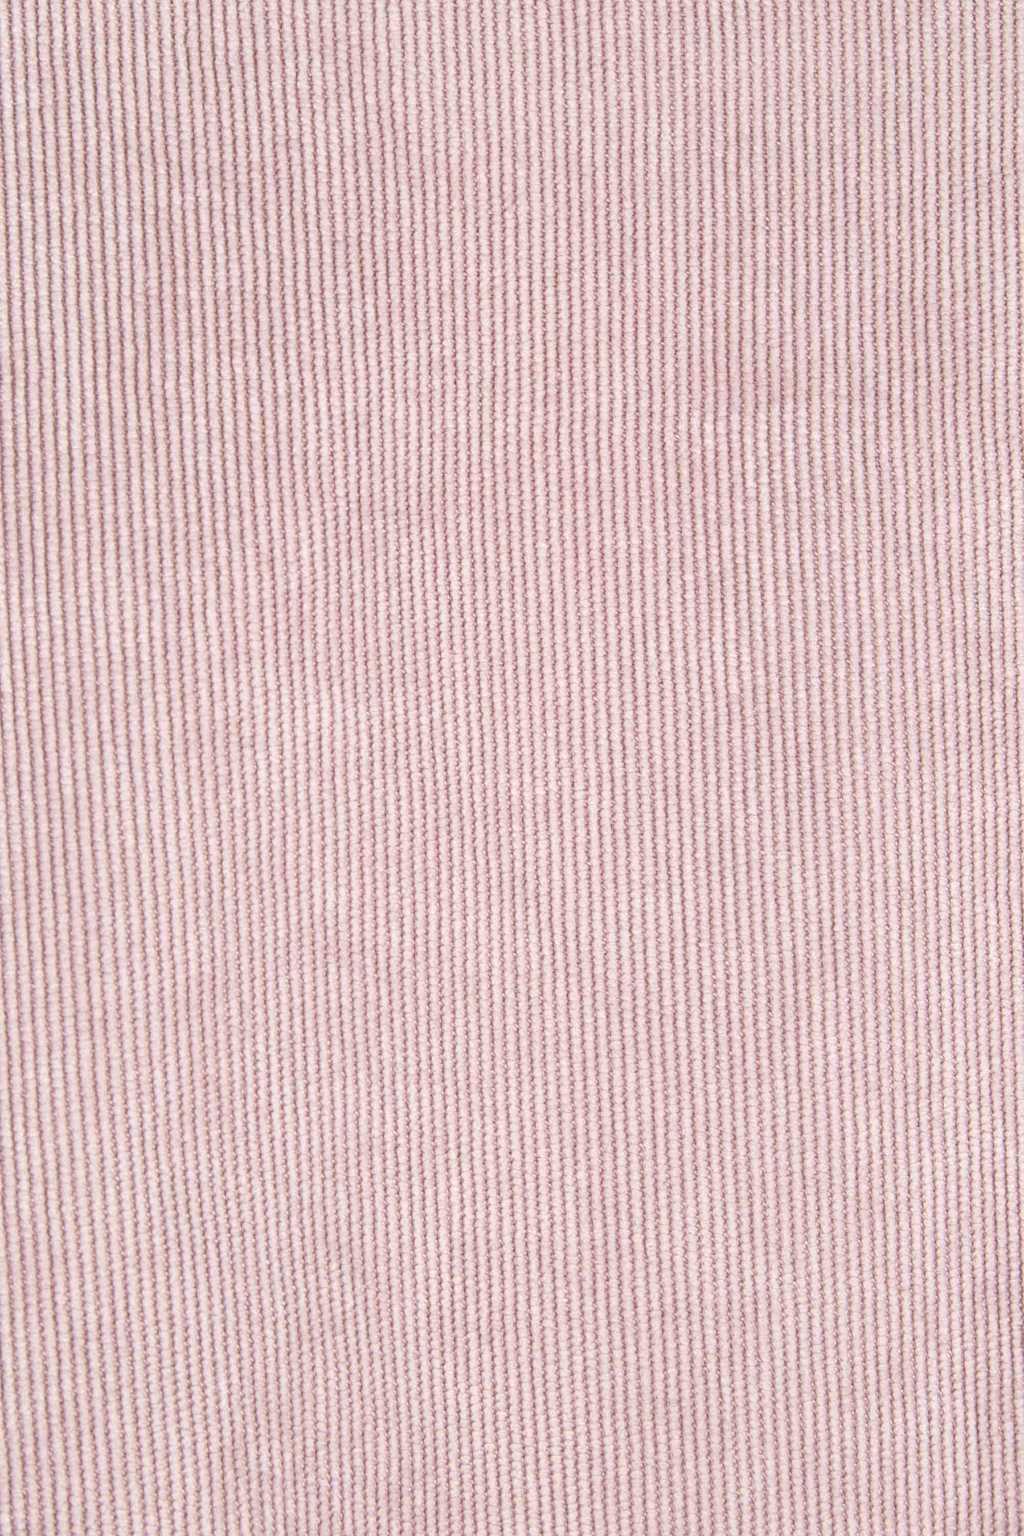 Tunic H033 Pink 6